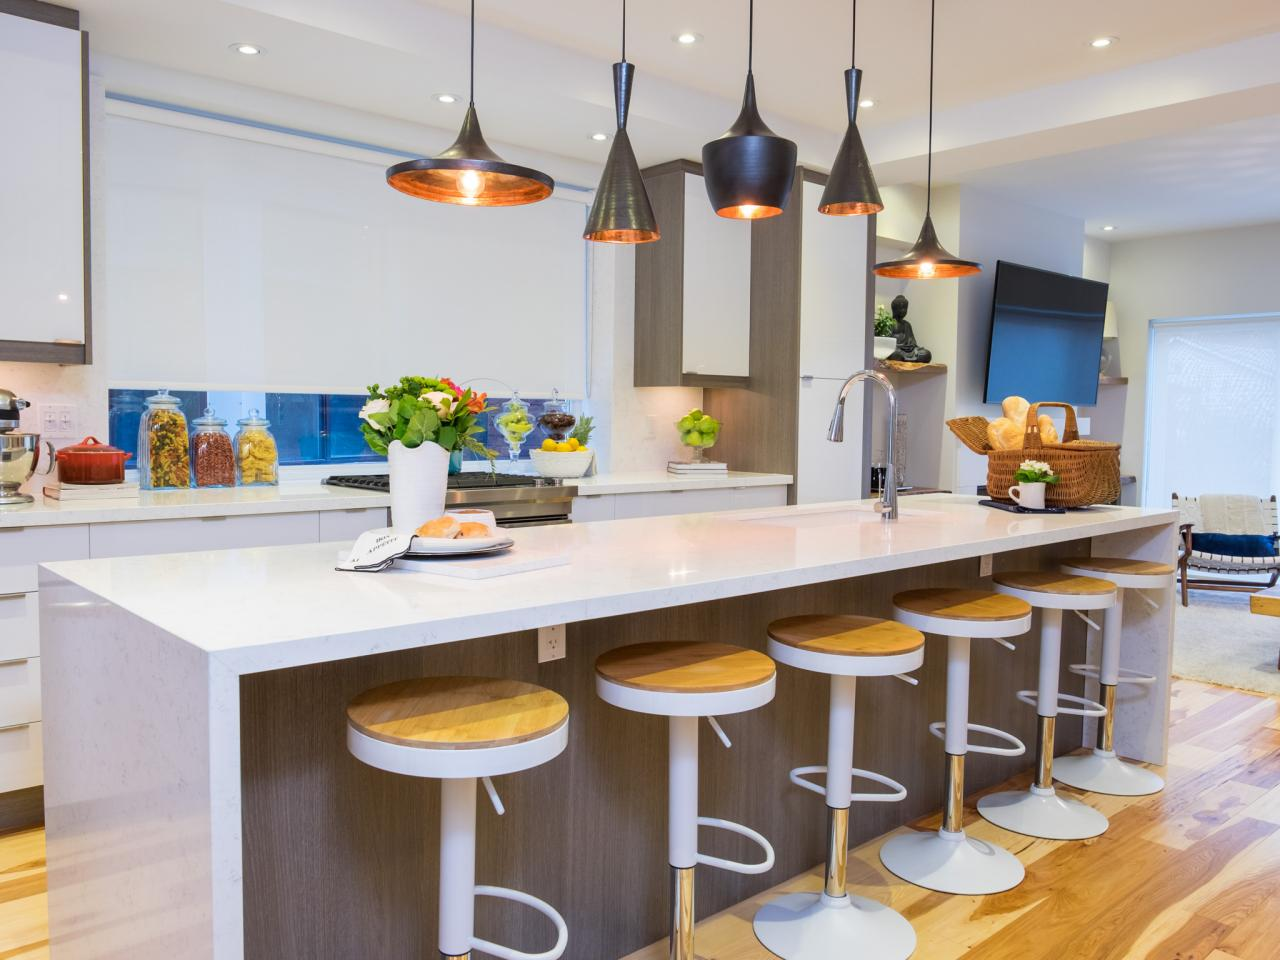 photos property brothers hgtv. Black Bedroom Furniture Sets. Home Design Ideas